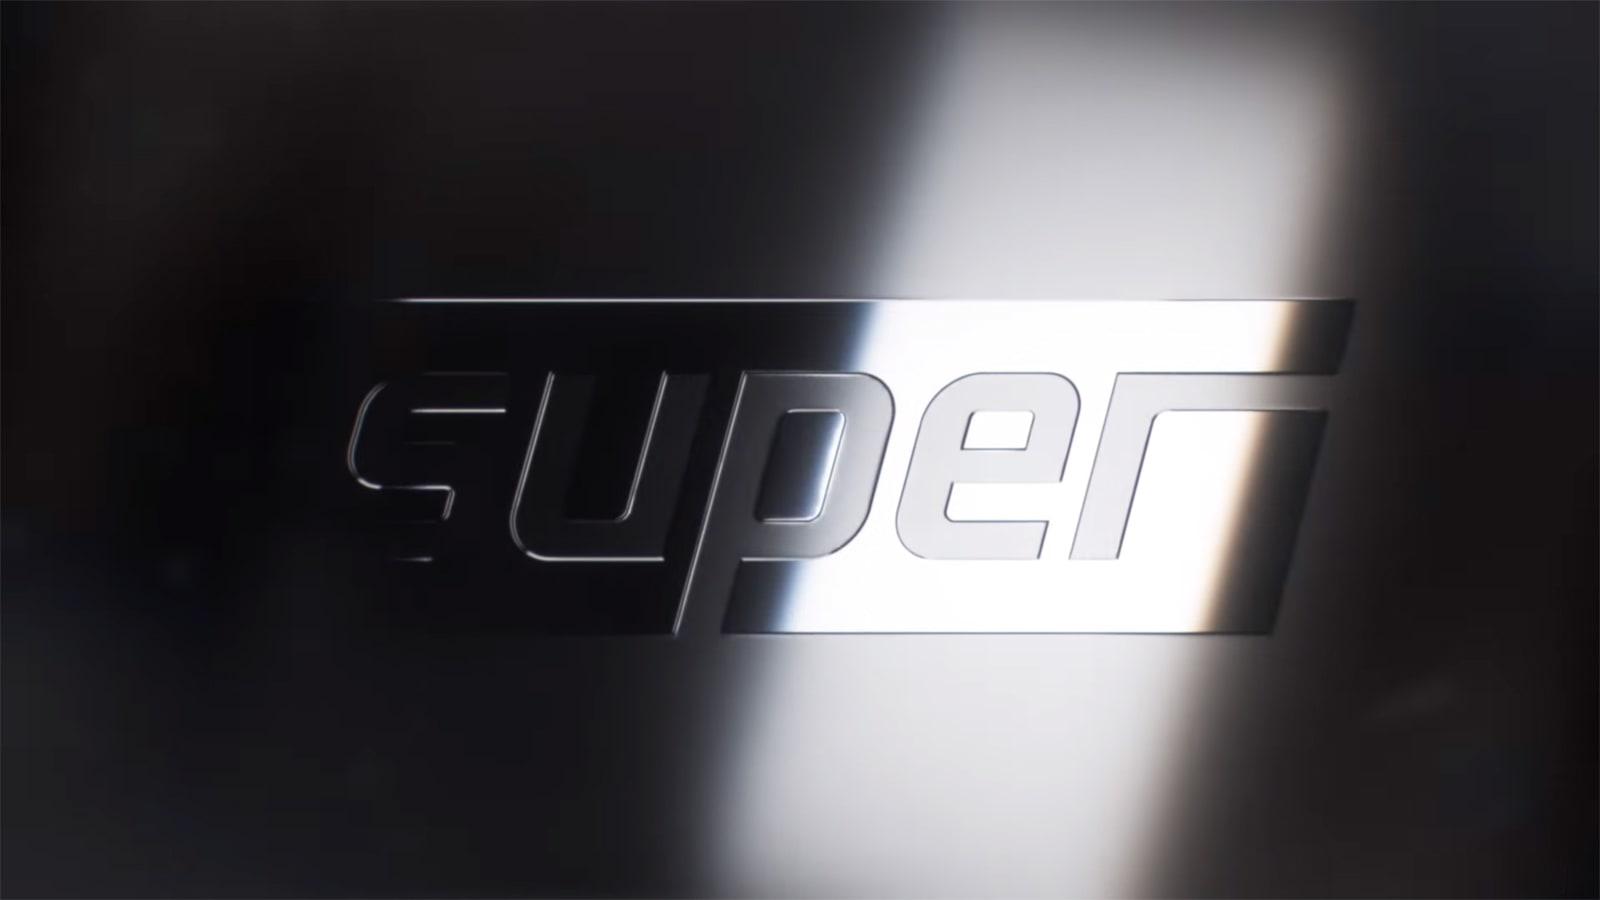 NVIDIA 'Super' GPU leaks hint at not-so-super speed boosts